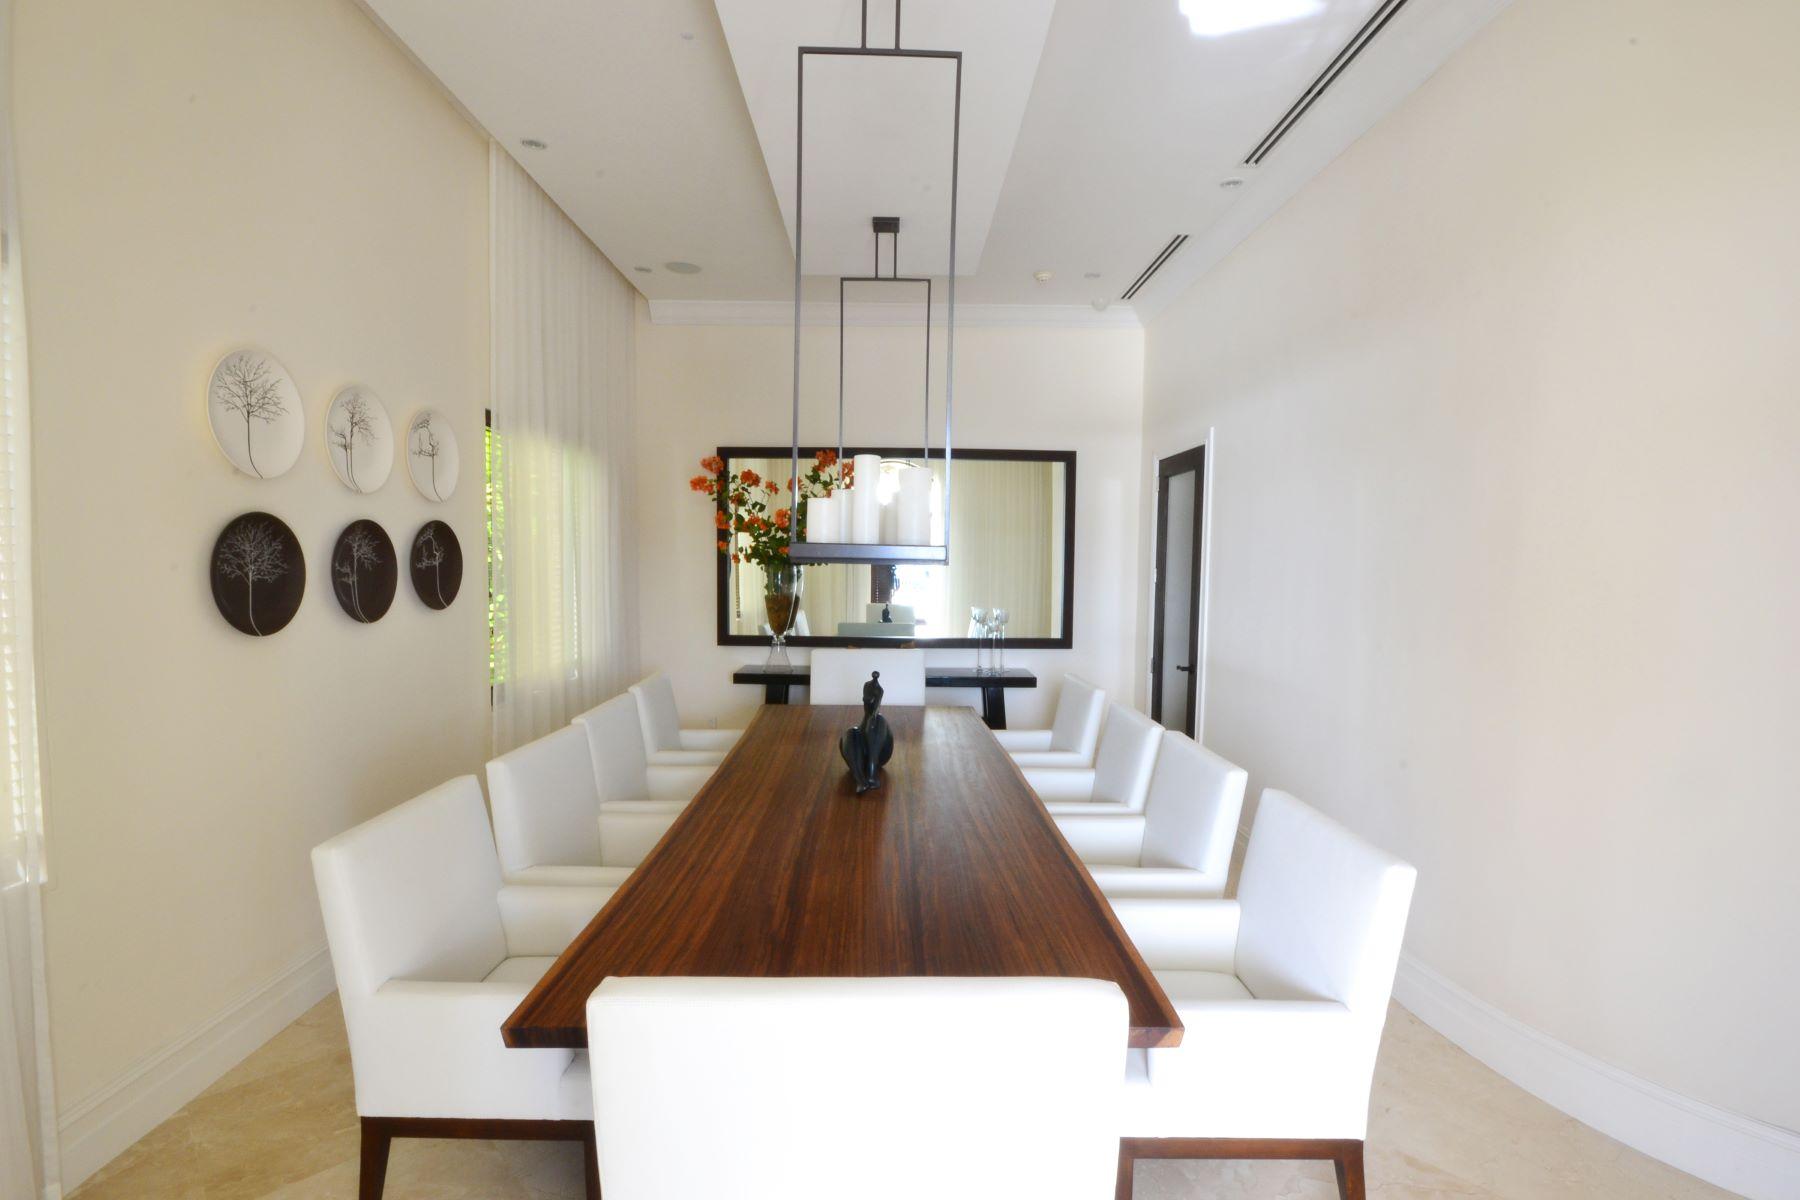 Additional photo for property listing at Jan Sofat 224 库拉索岛其他城市, 库拉索岛城市 库拉索岛